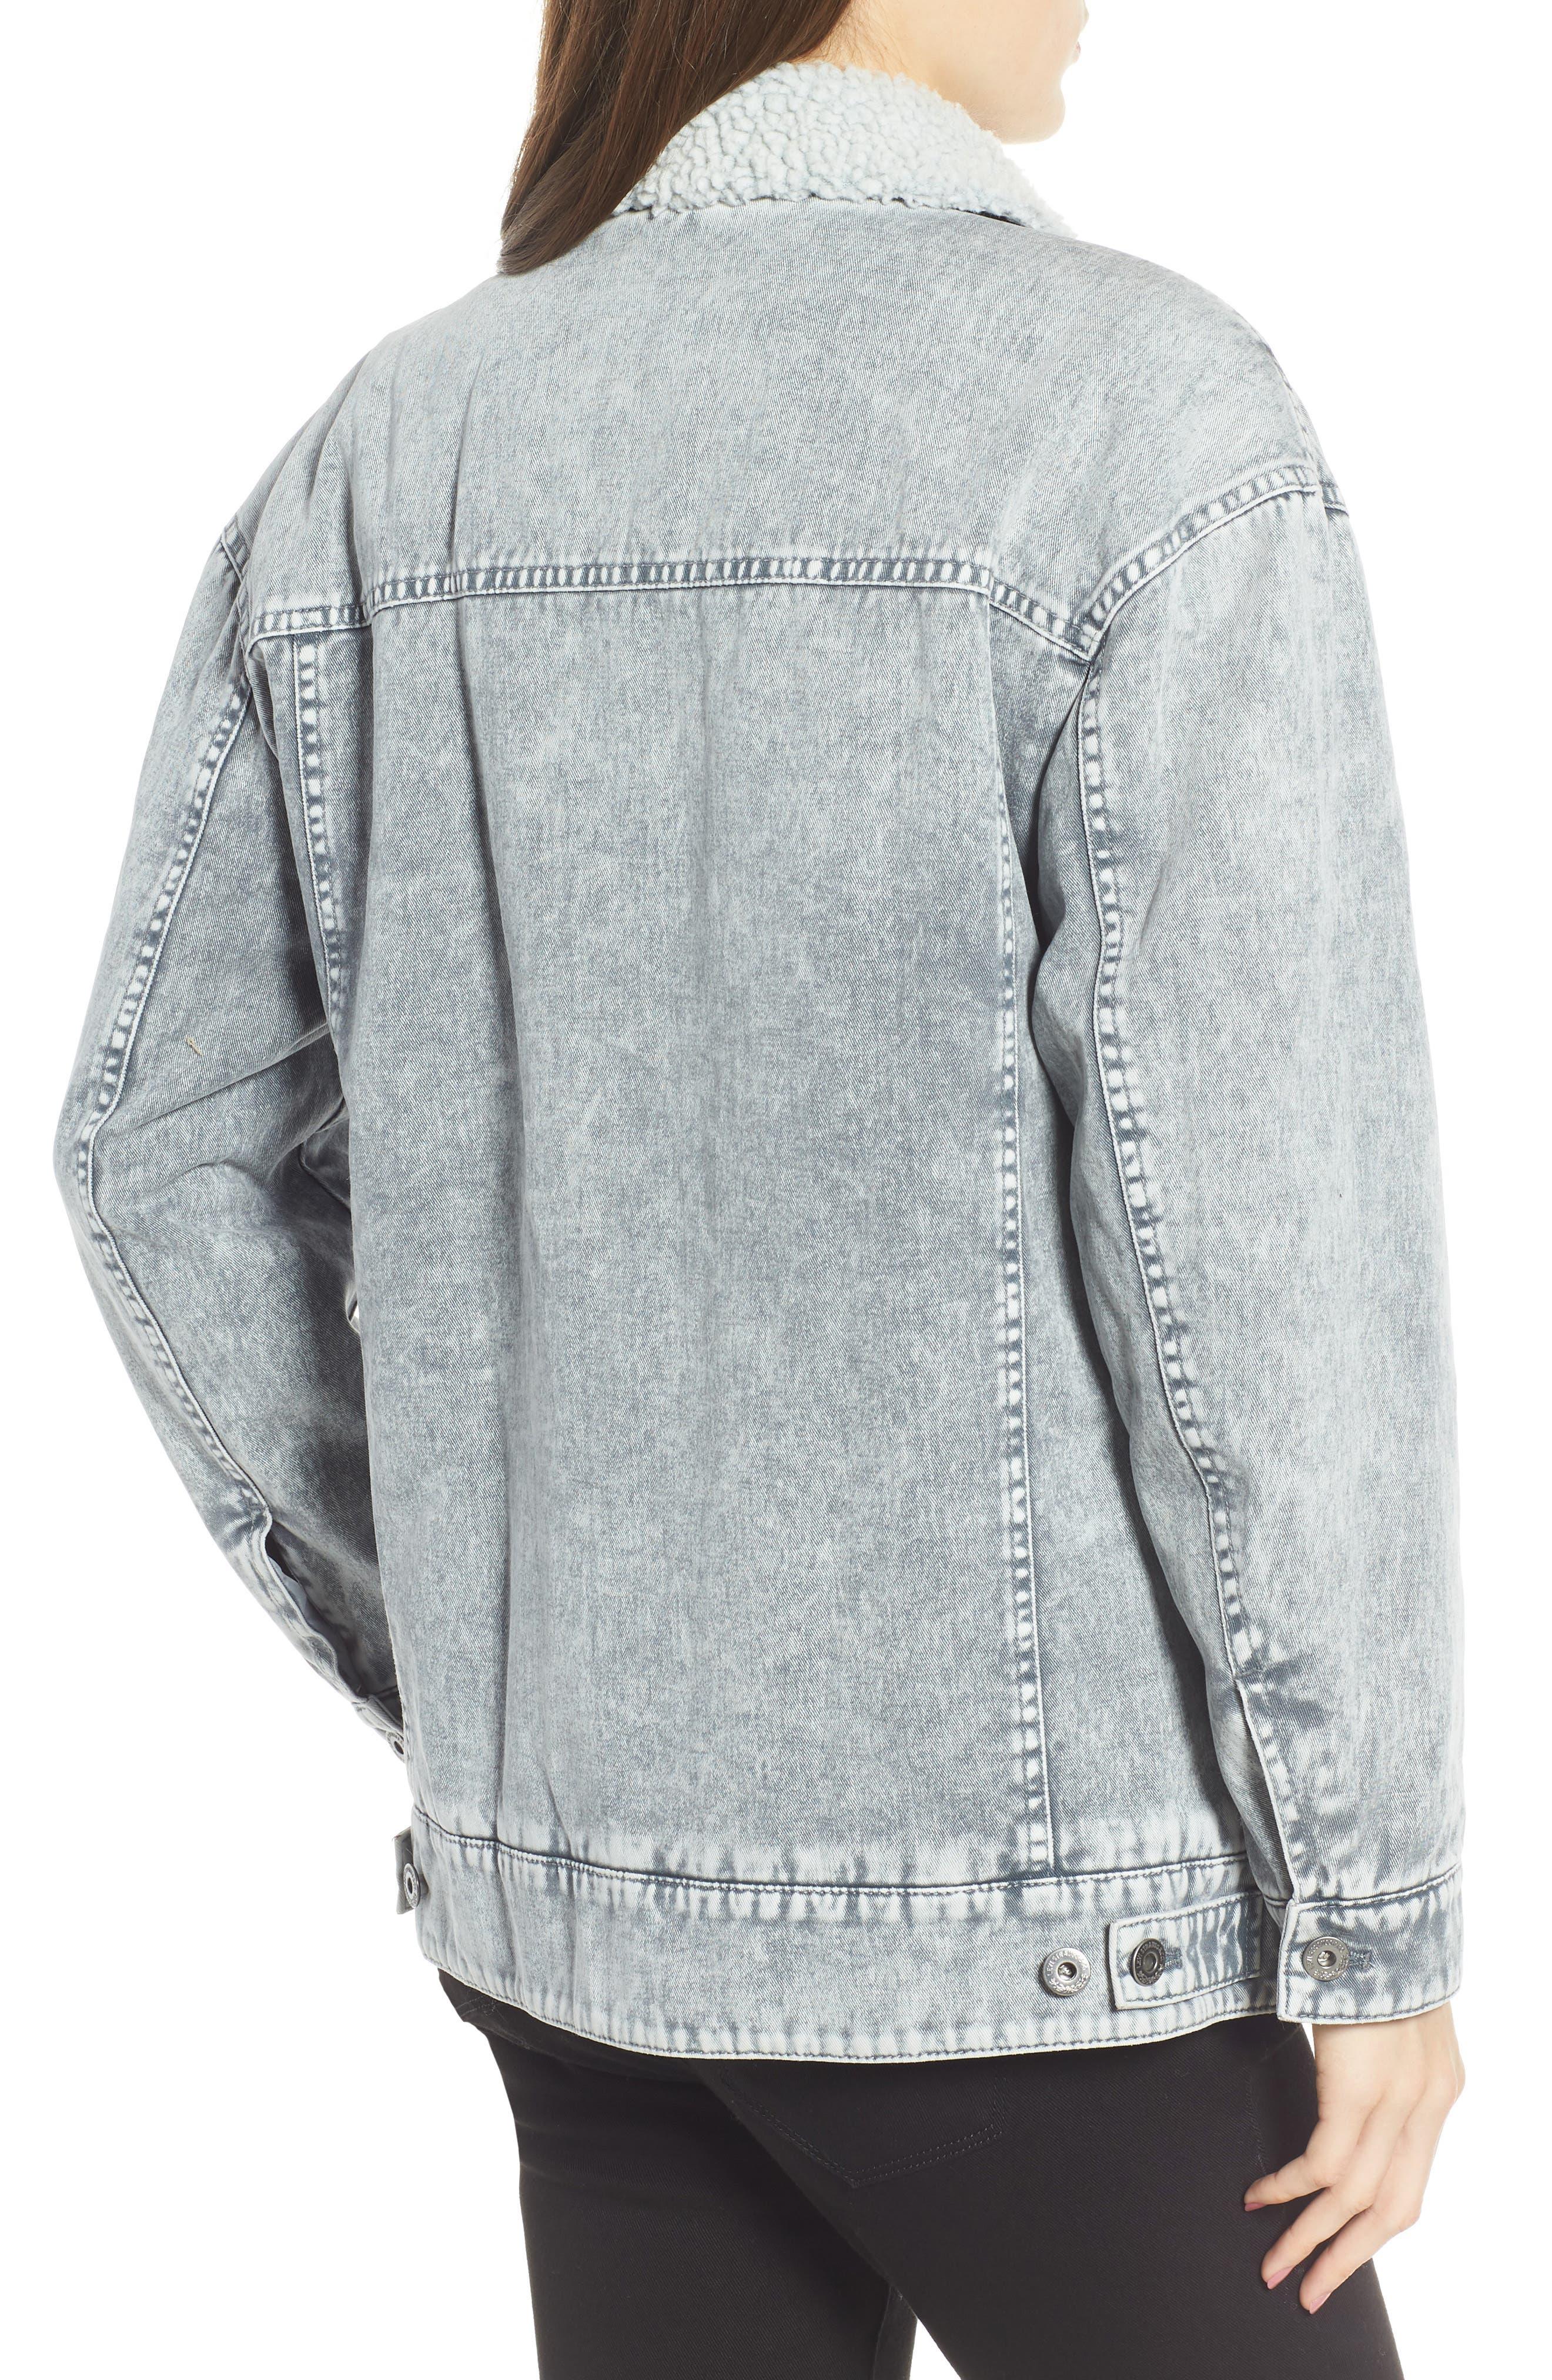 Levi's<sup>®</sup> Oversize Denim Trucker Jacket,                             Alternate thumbnail 2, color,                             GREY